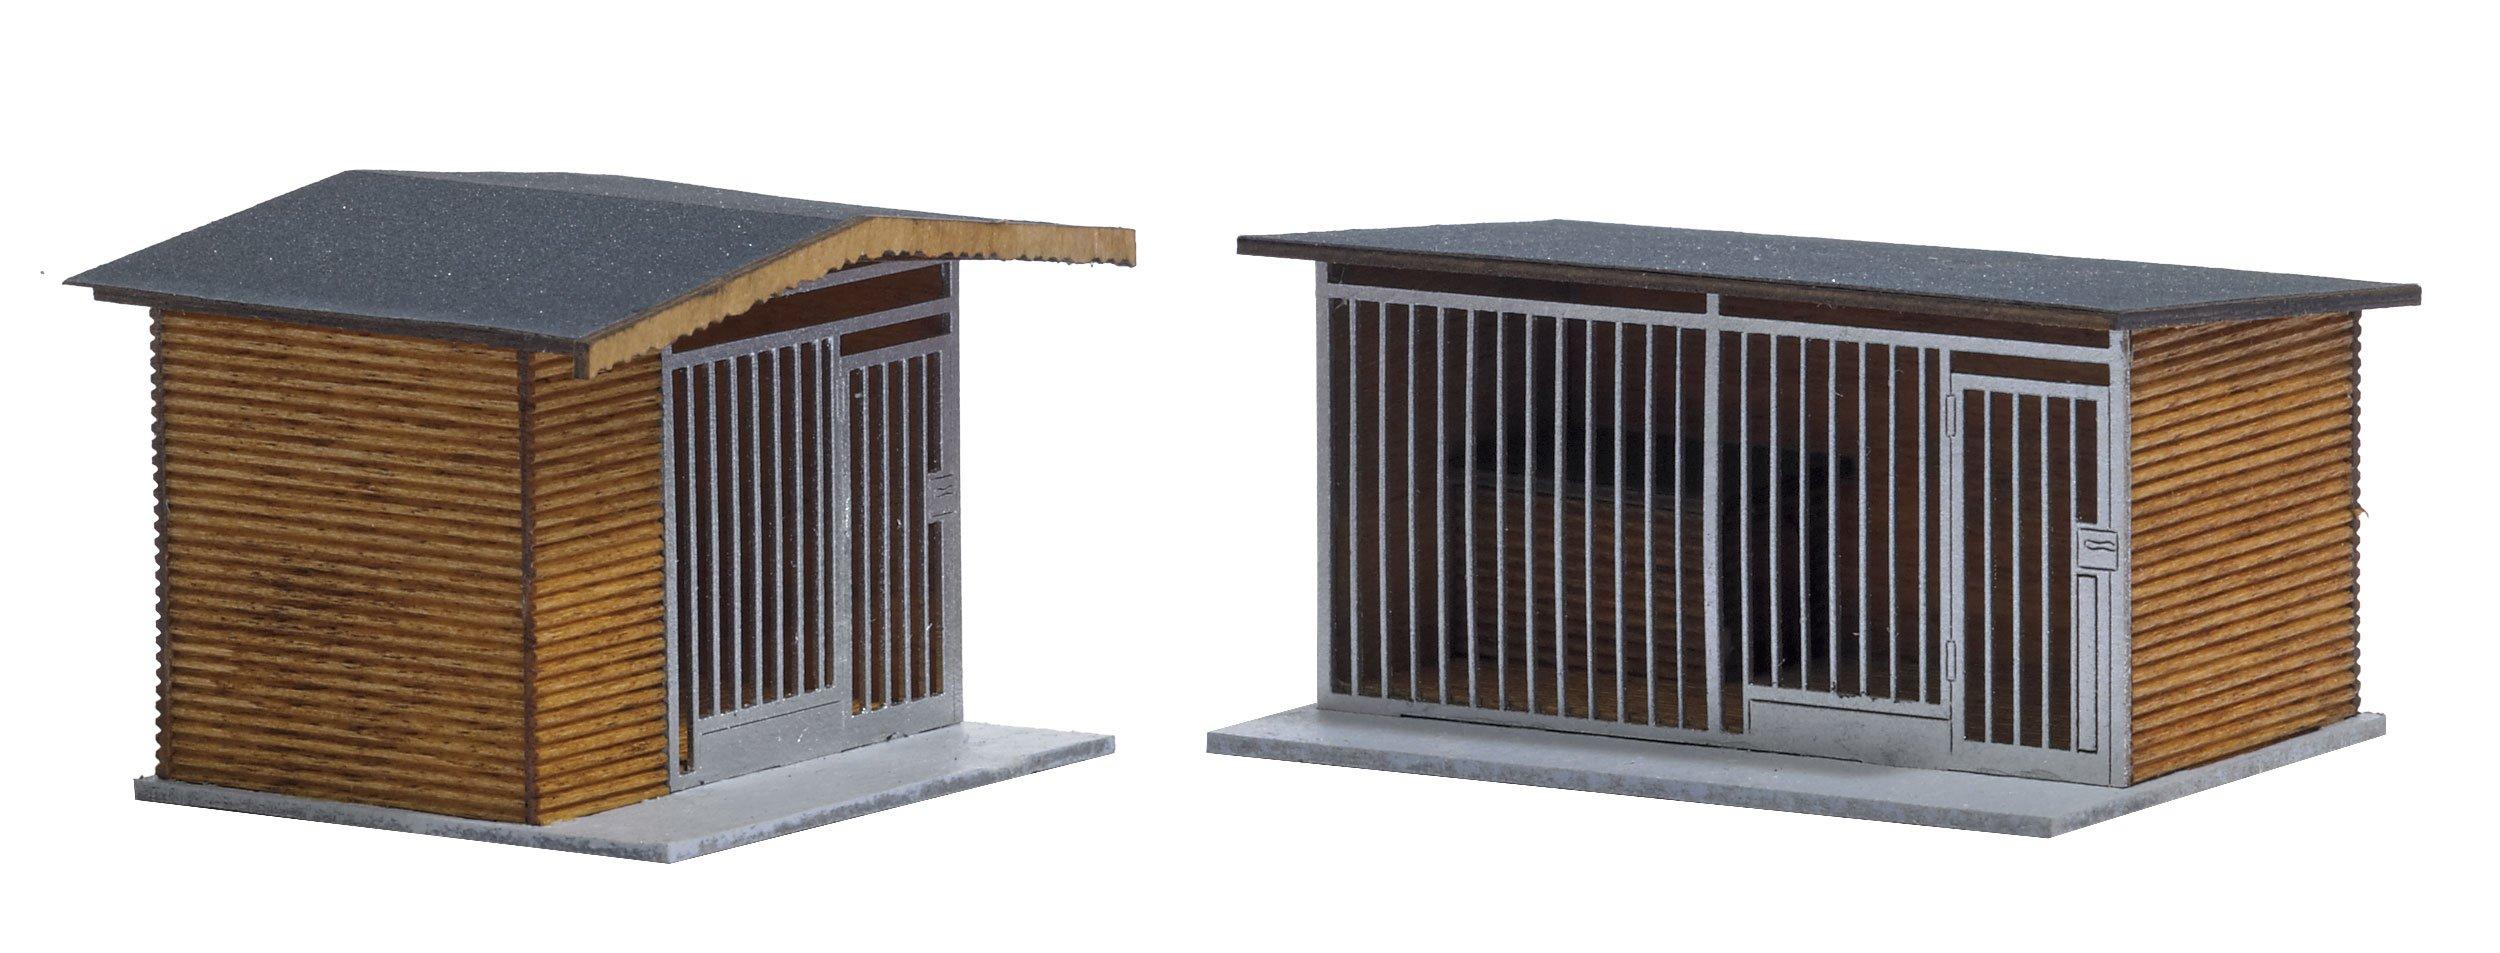 Busch 1492 Dog Pens 2/HO Structure Scale Model